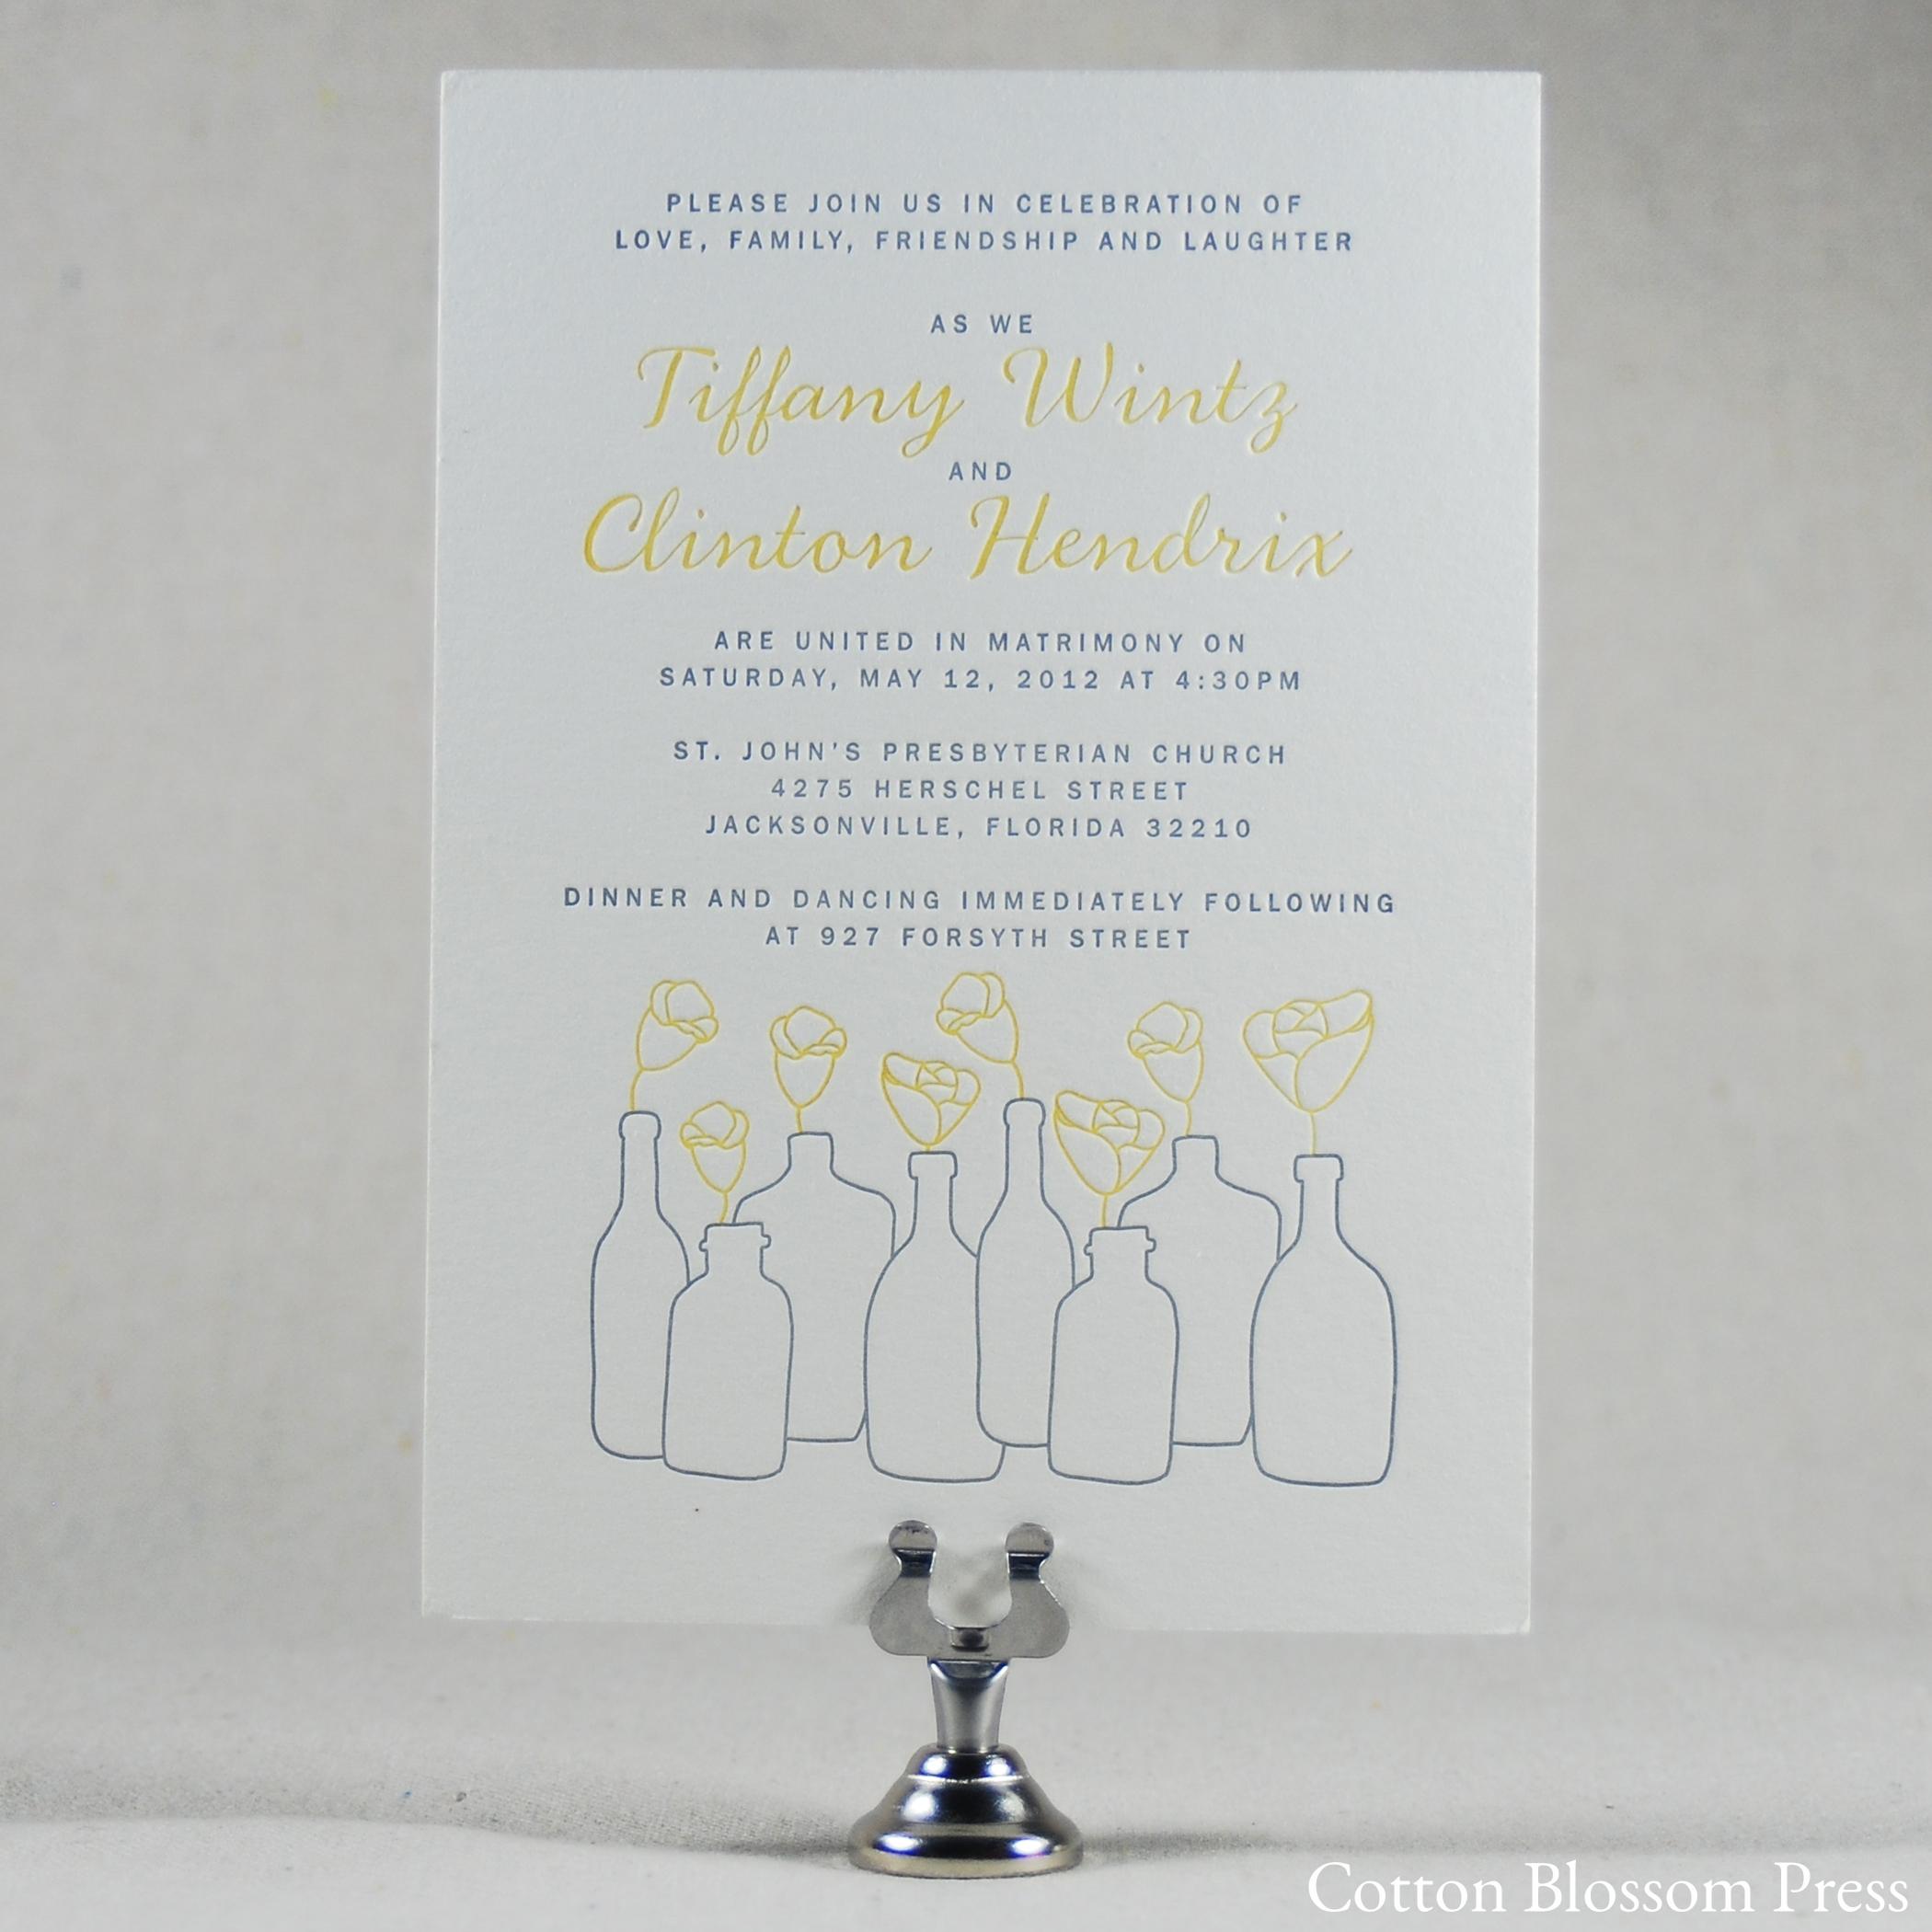 Wedding_TWH_Invite.JPG